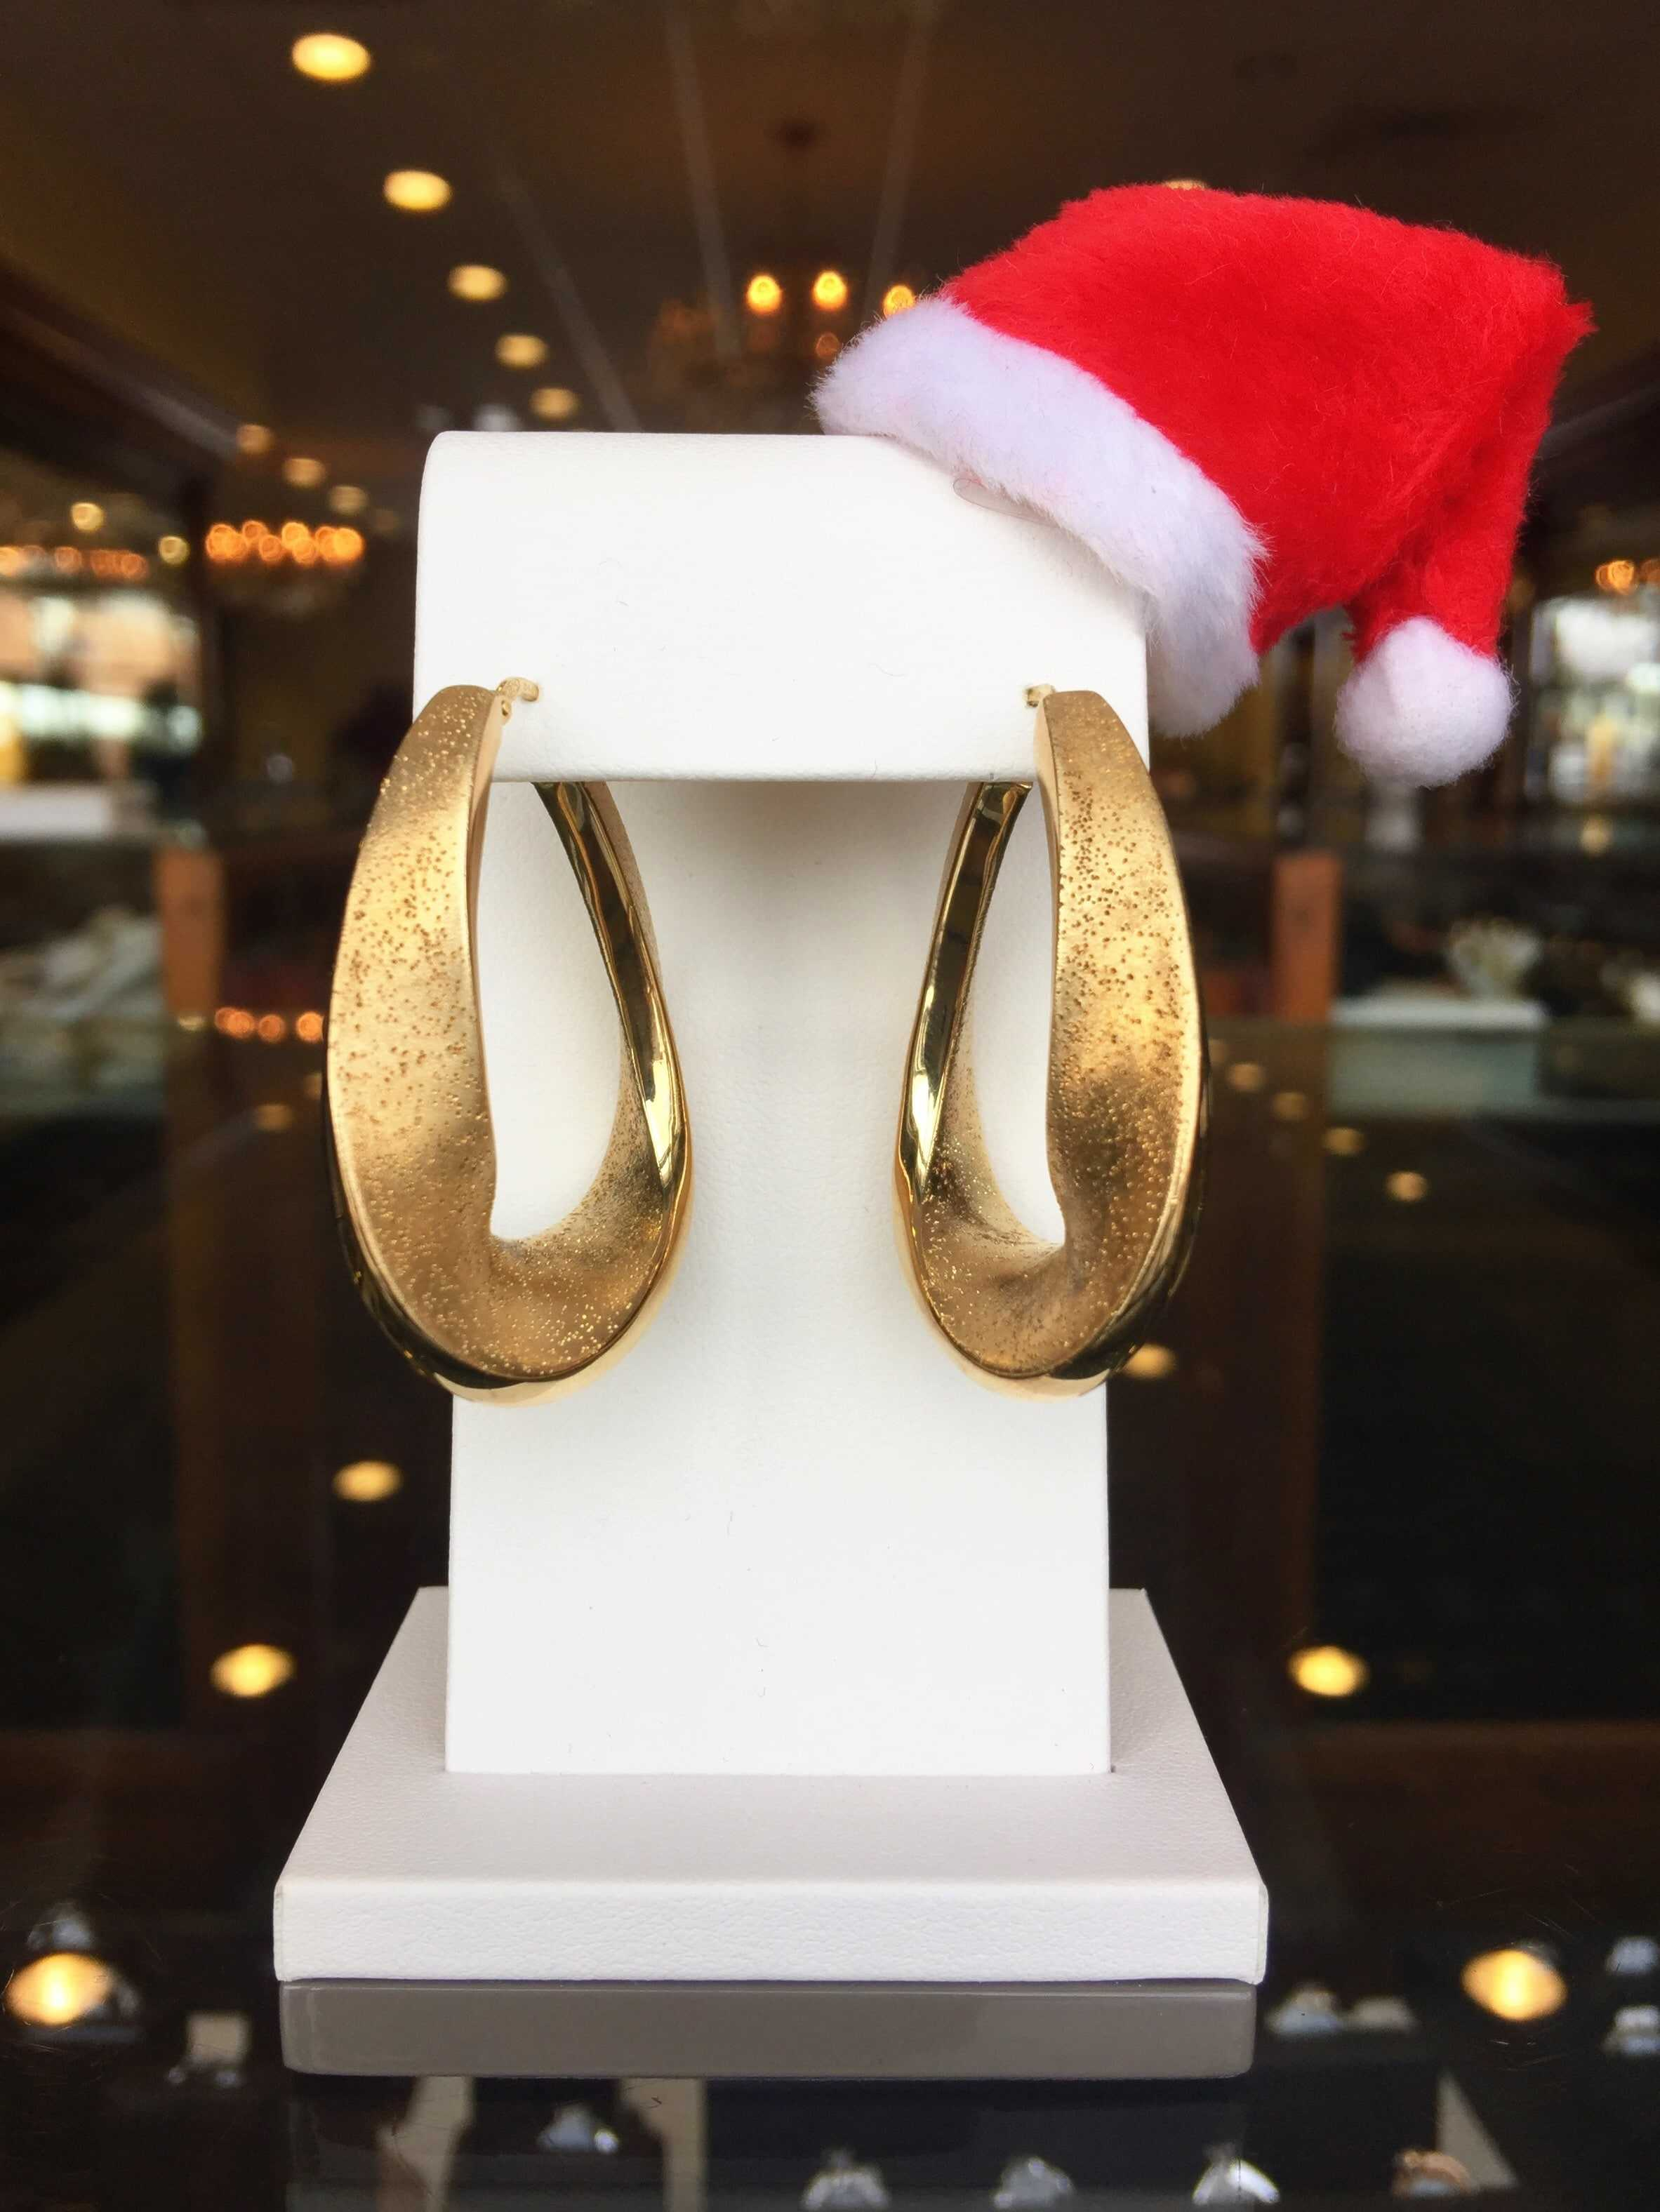 Facebook Flash Giveaway #3…Charles Garnier Earring Set